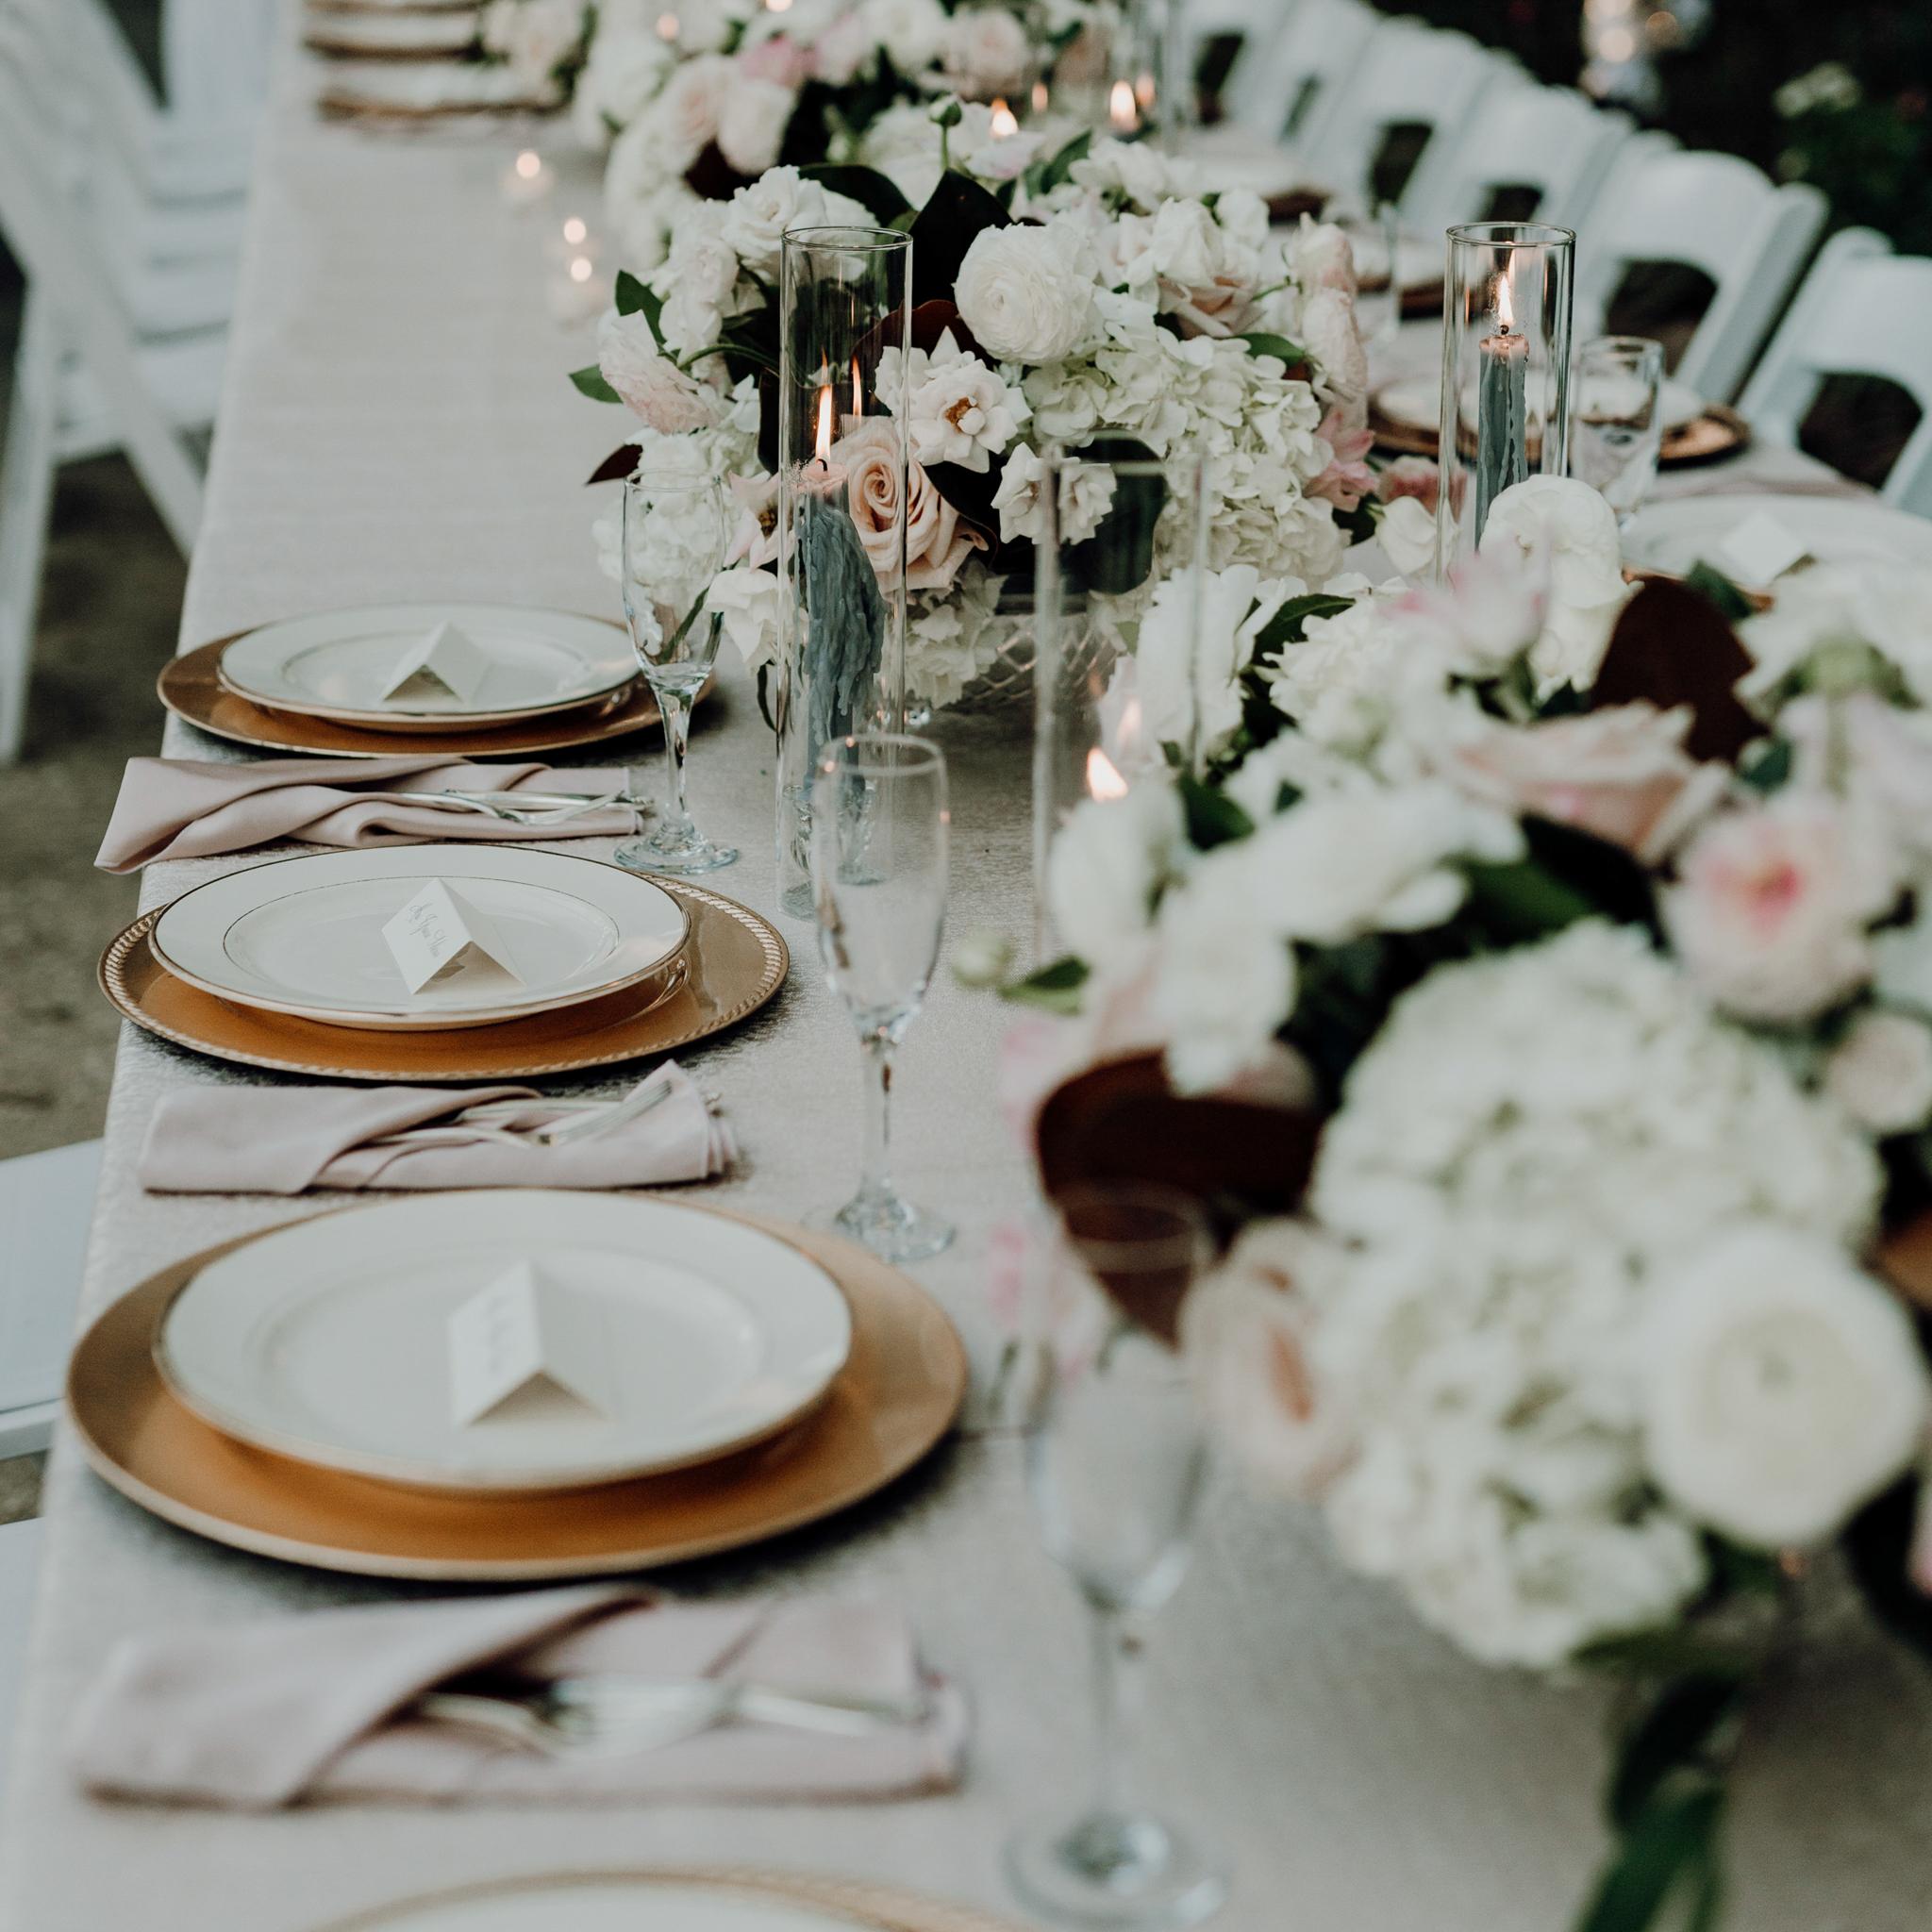 Houston Wedding Photographer-Intimate Texas Backyard Wedding- Houston Wedding Photographer -Kristen Giles Photography-52.jpg